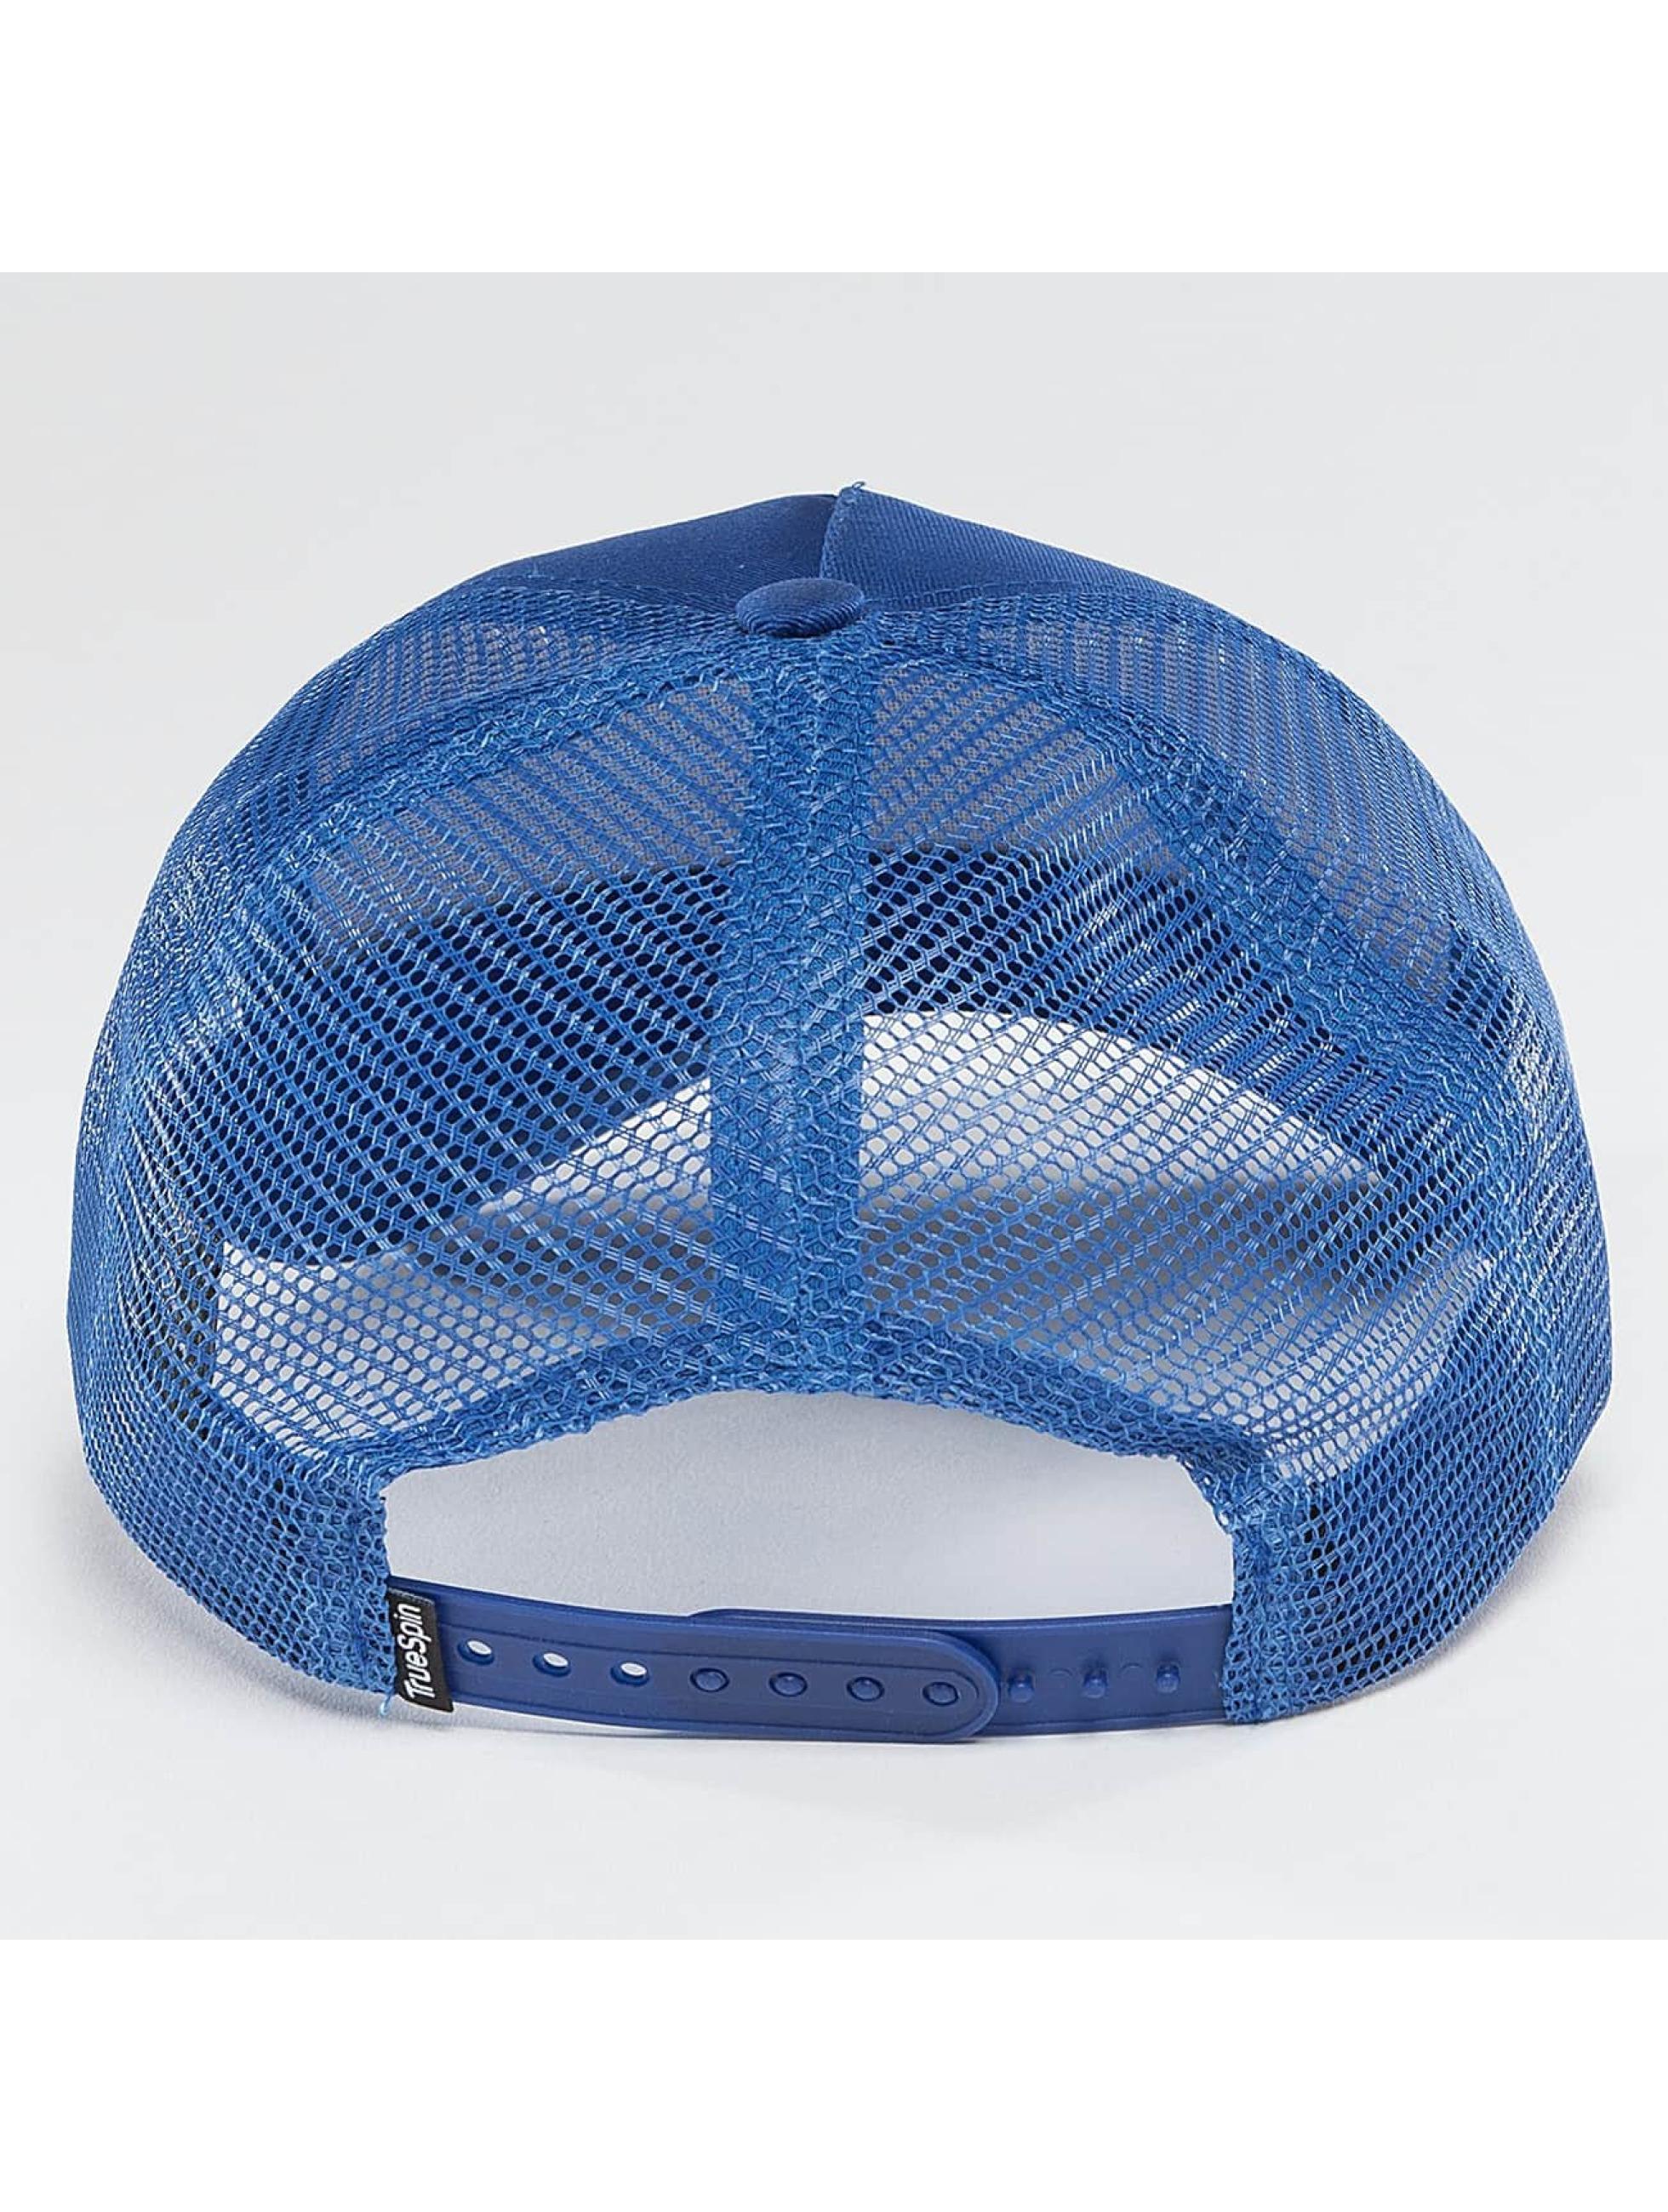 TrueSpin trucker cap Blank blauw